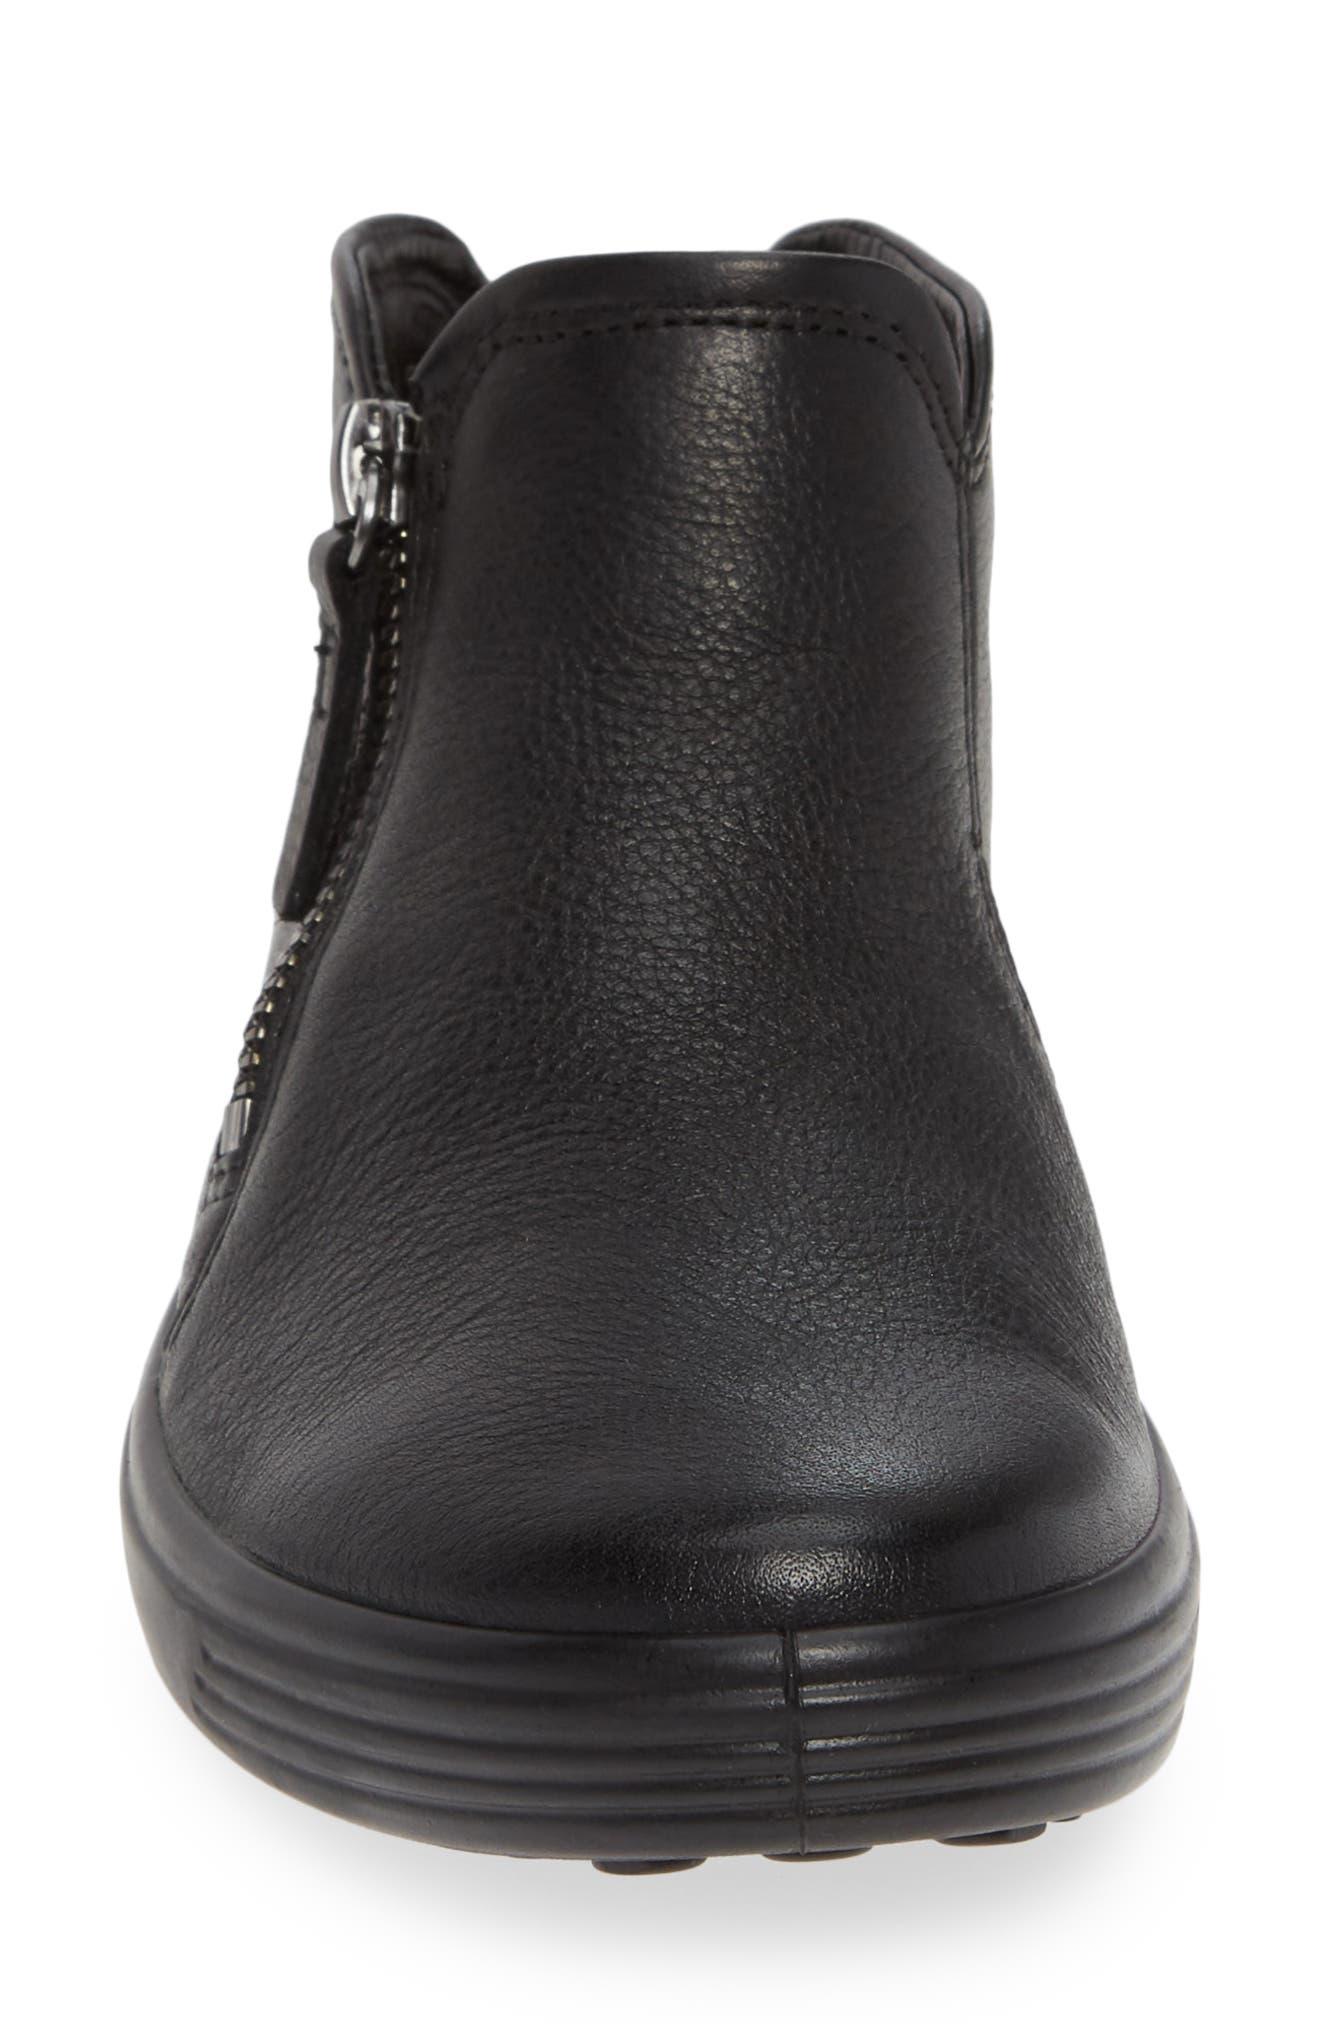 Soft 7 Mid Top Sneaker,                             Alternate thumbnail 4, color,                             BLACK/ BLACK LEATHER